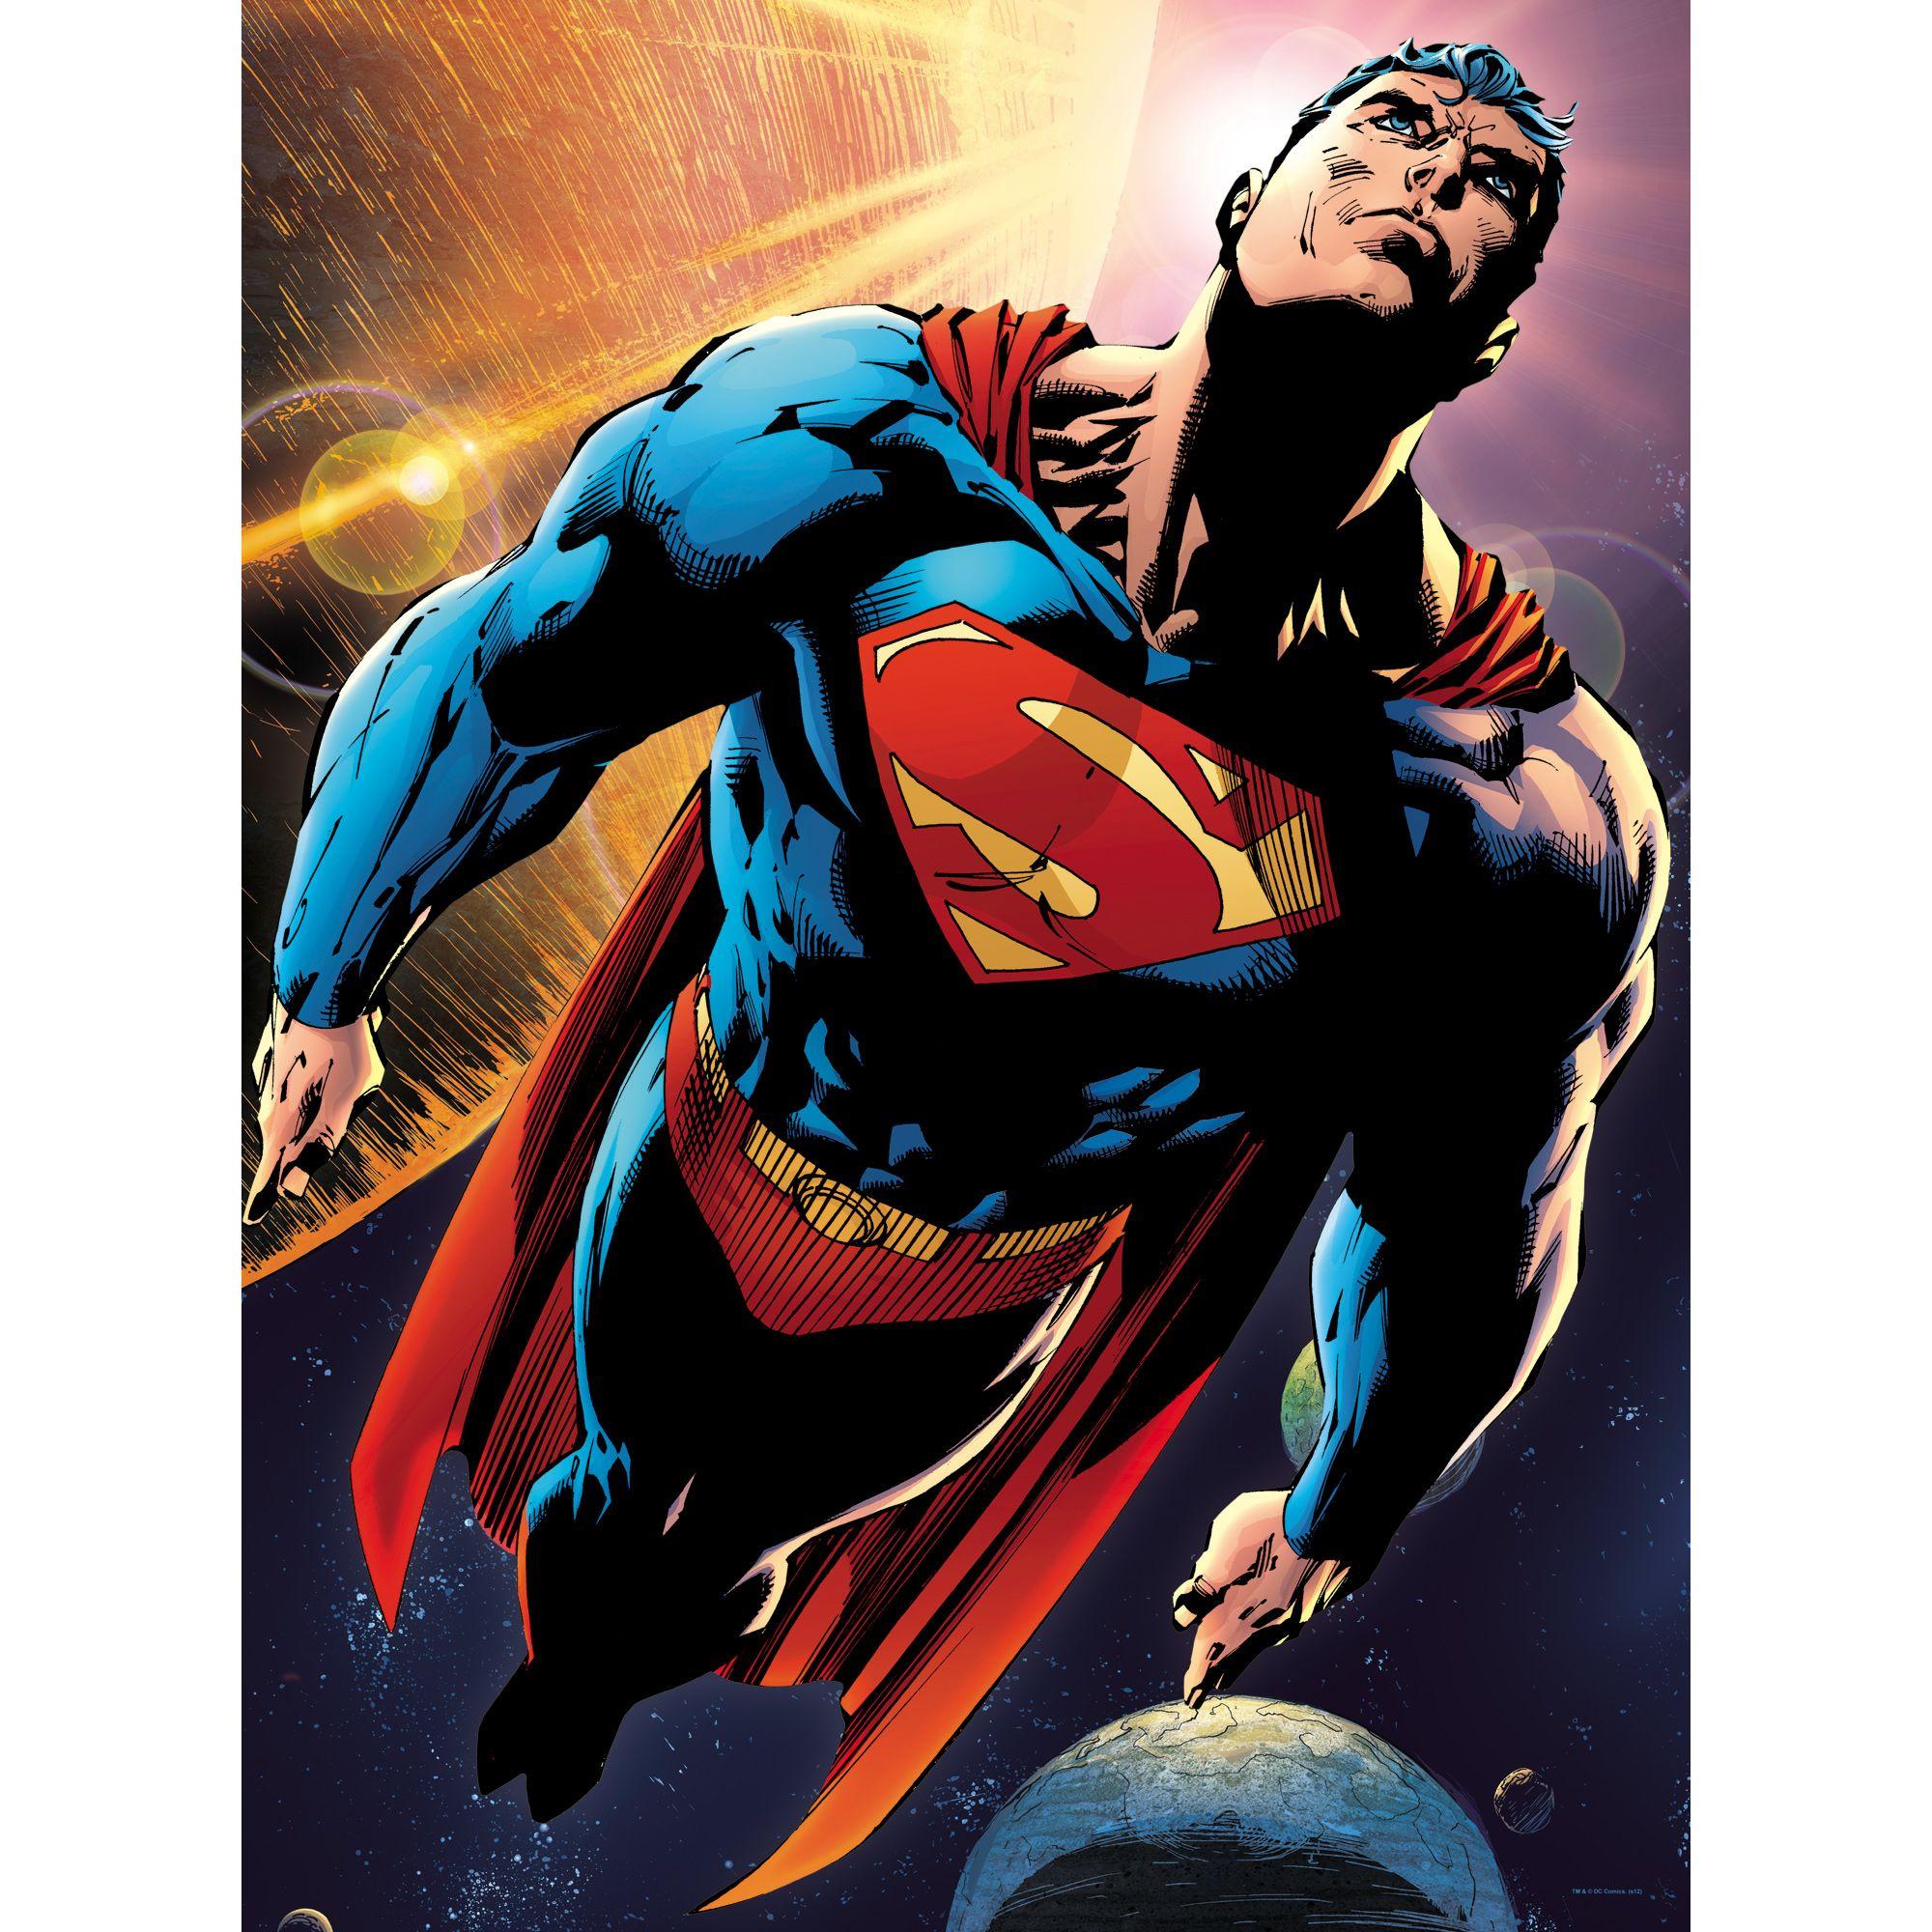 superman dc comics wallpaper - Buscar con Google - Visit to grab an amazing super  hero shirt now on sale!